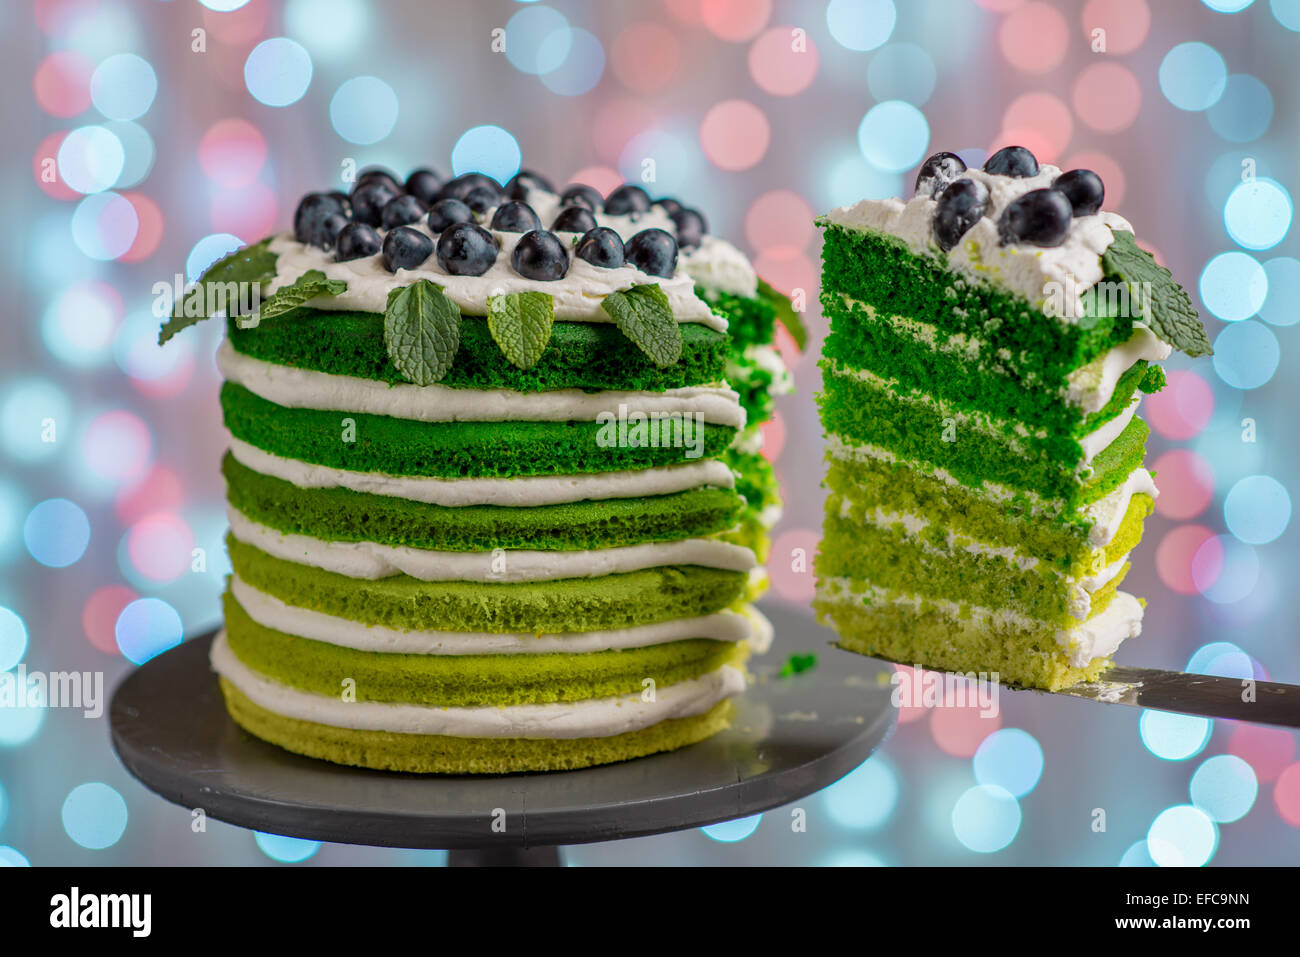 Cutting beautiful green sponge cake on festive background with bokeh light - Stock Image